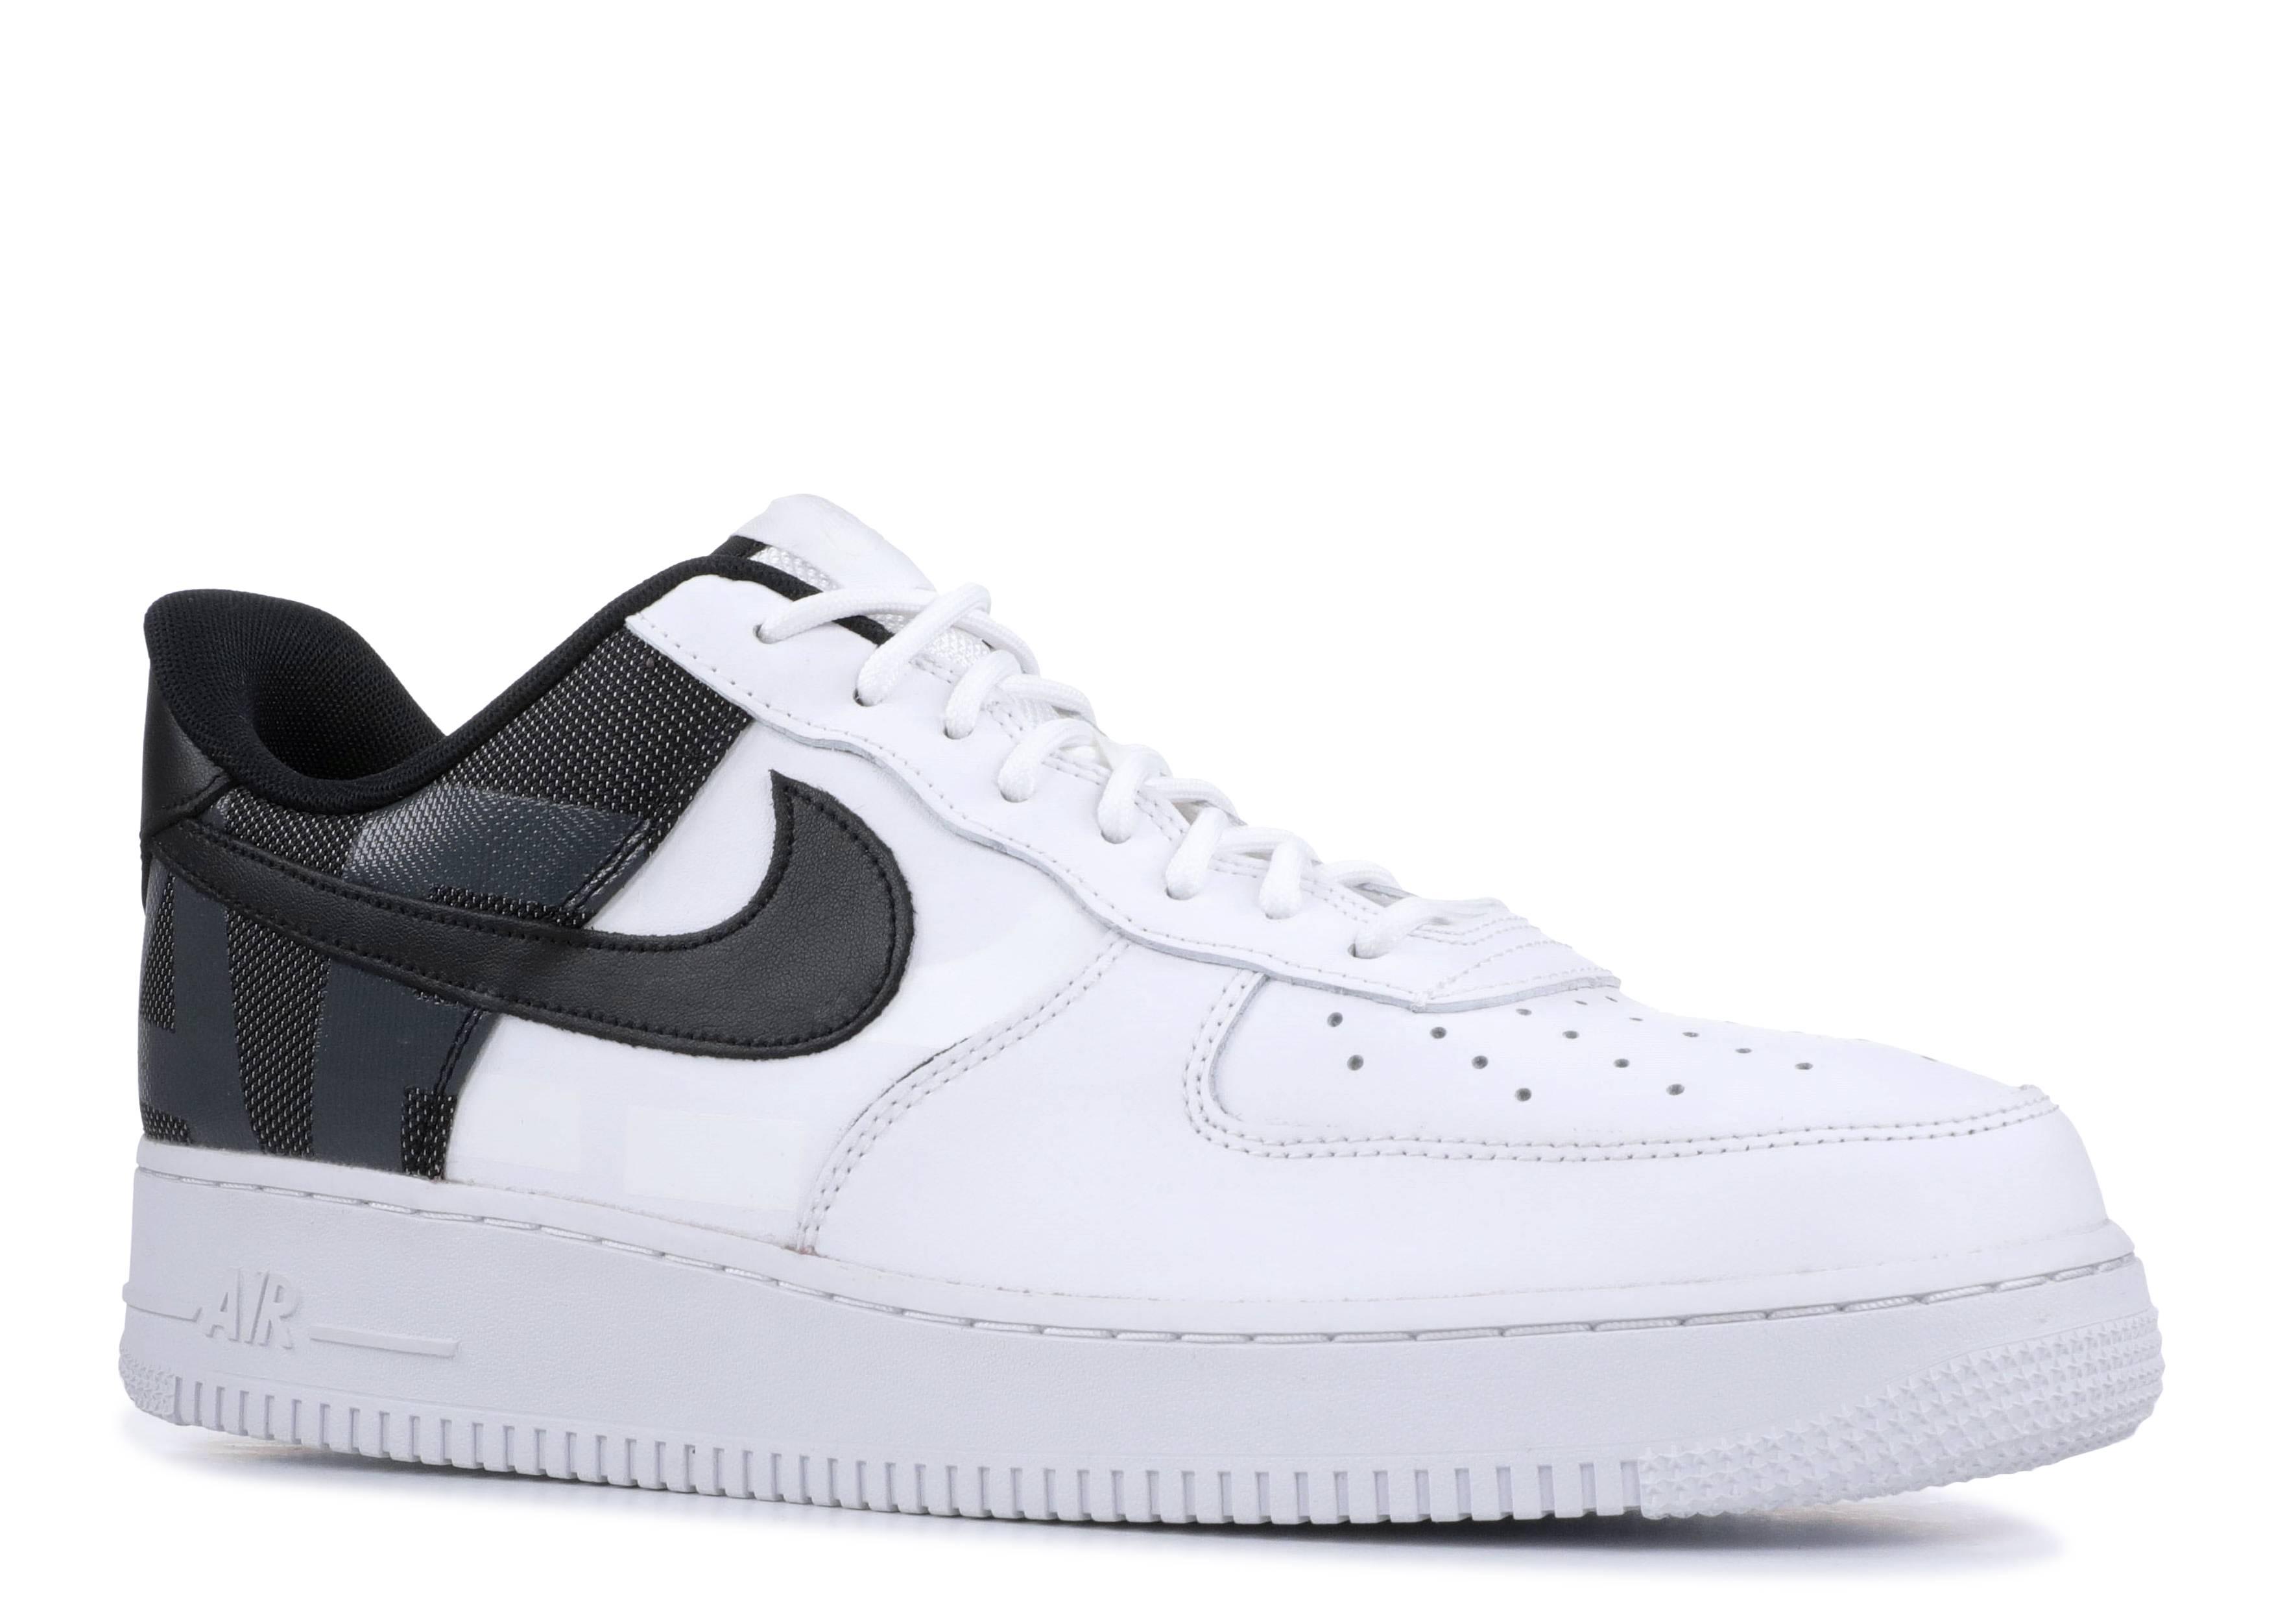 Big Logo Nike Air Force 1 Low WhiteWhiteBlack AV8363 100